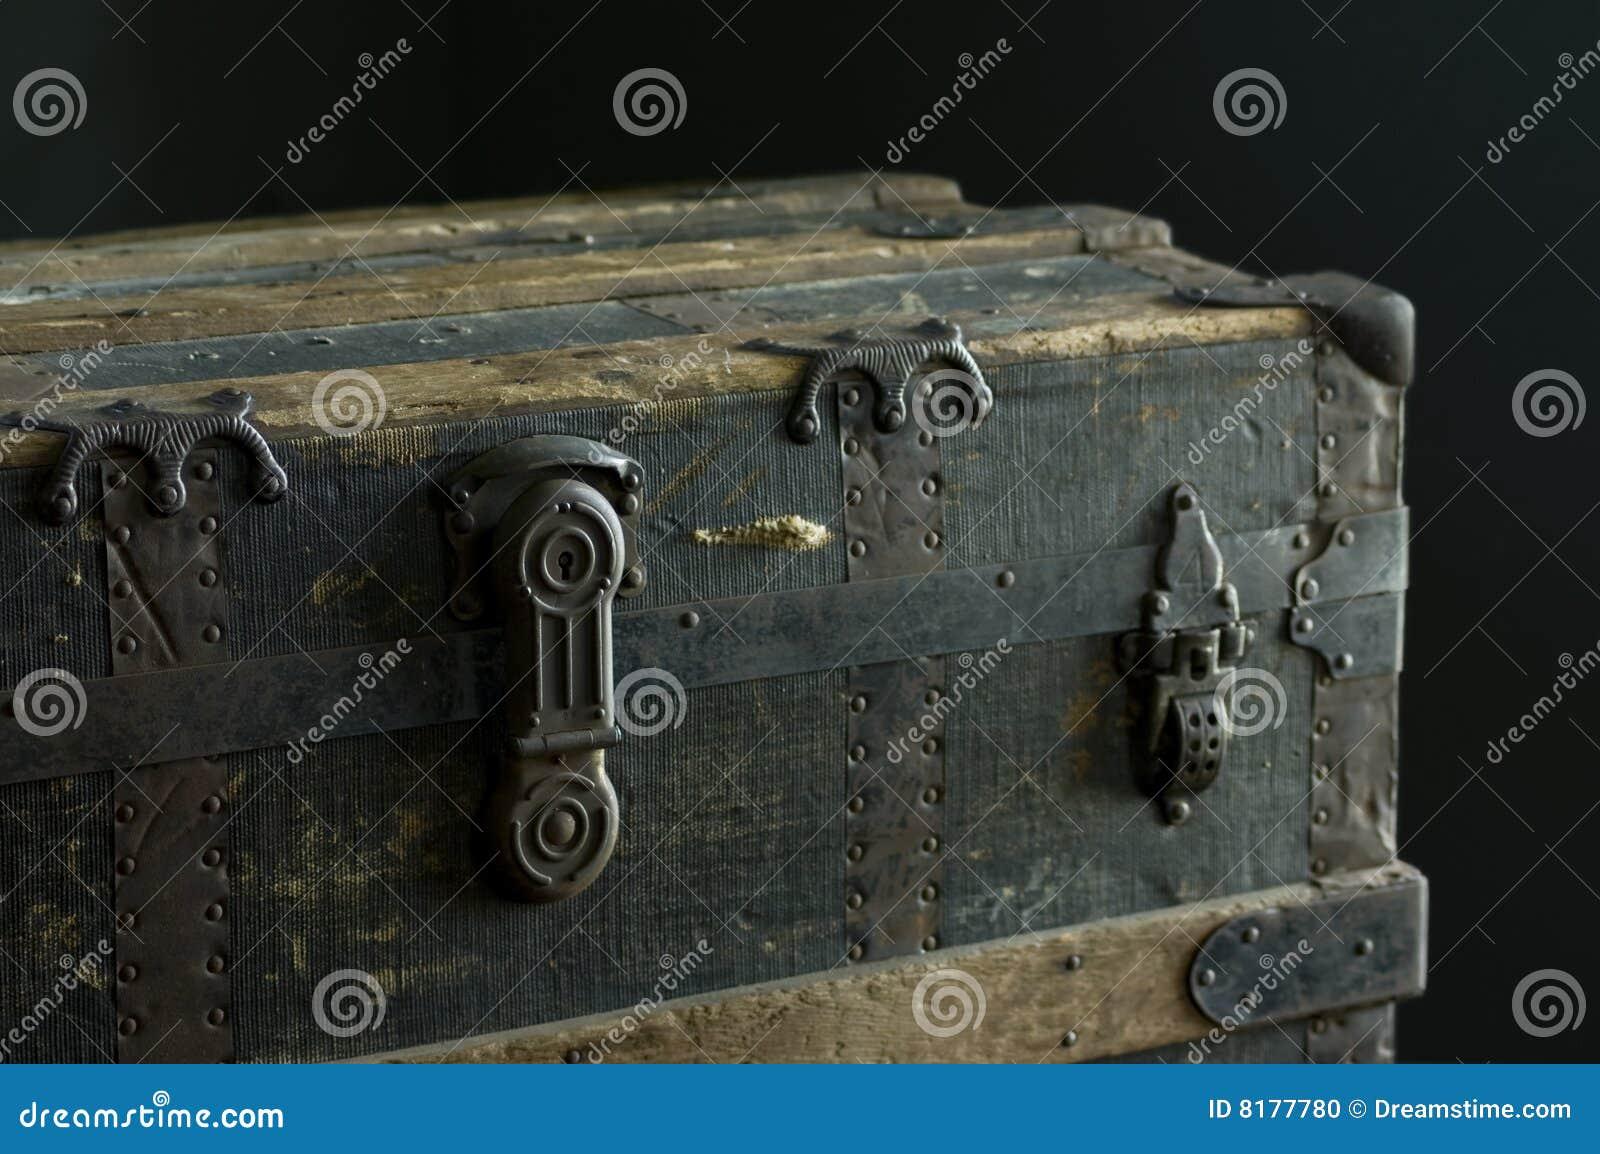 Antique Steamer Trunk Plans